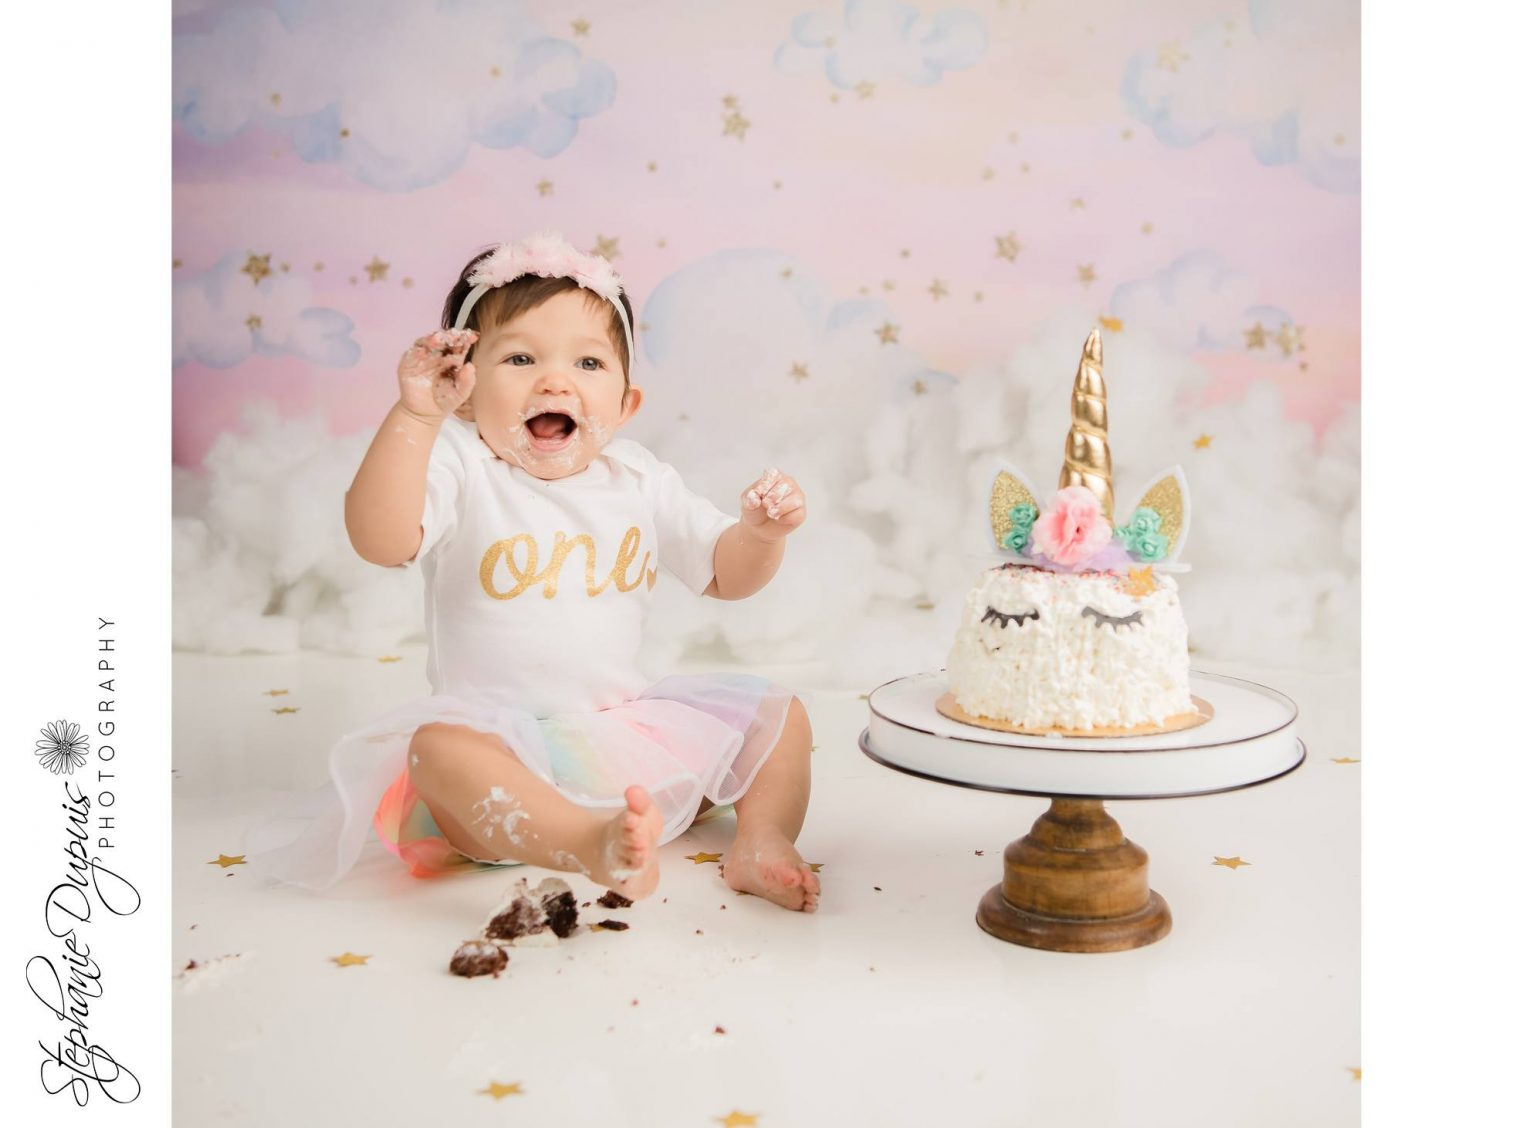 jones cake smash 4 1536x1128 - Portfolio: Warryn Cake Smash